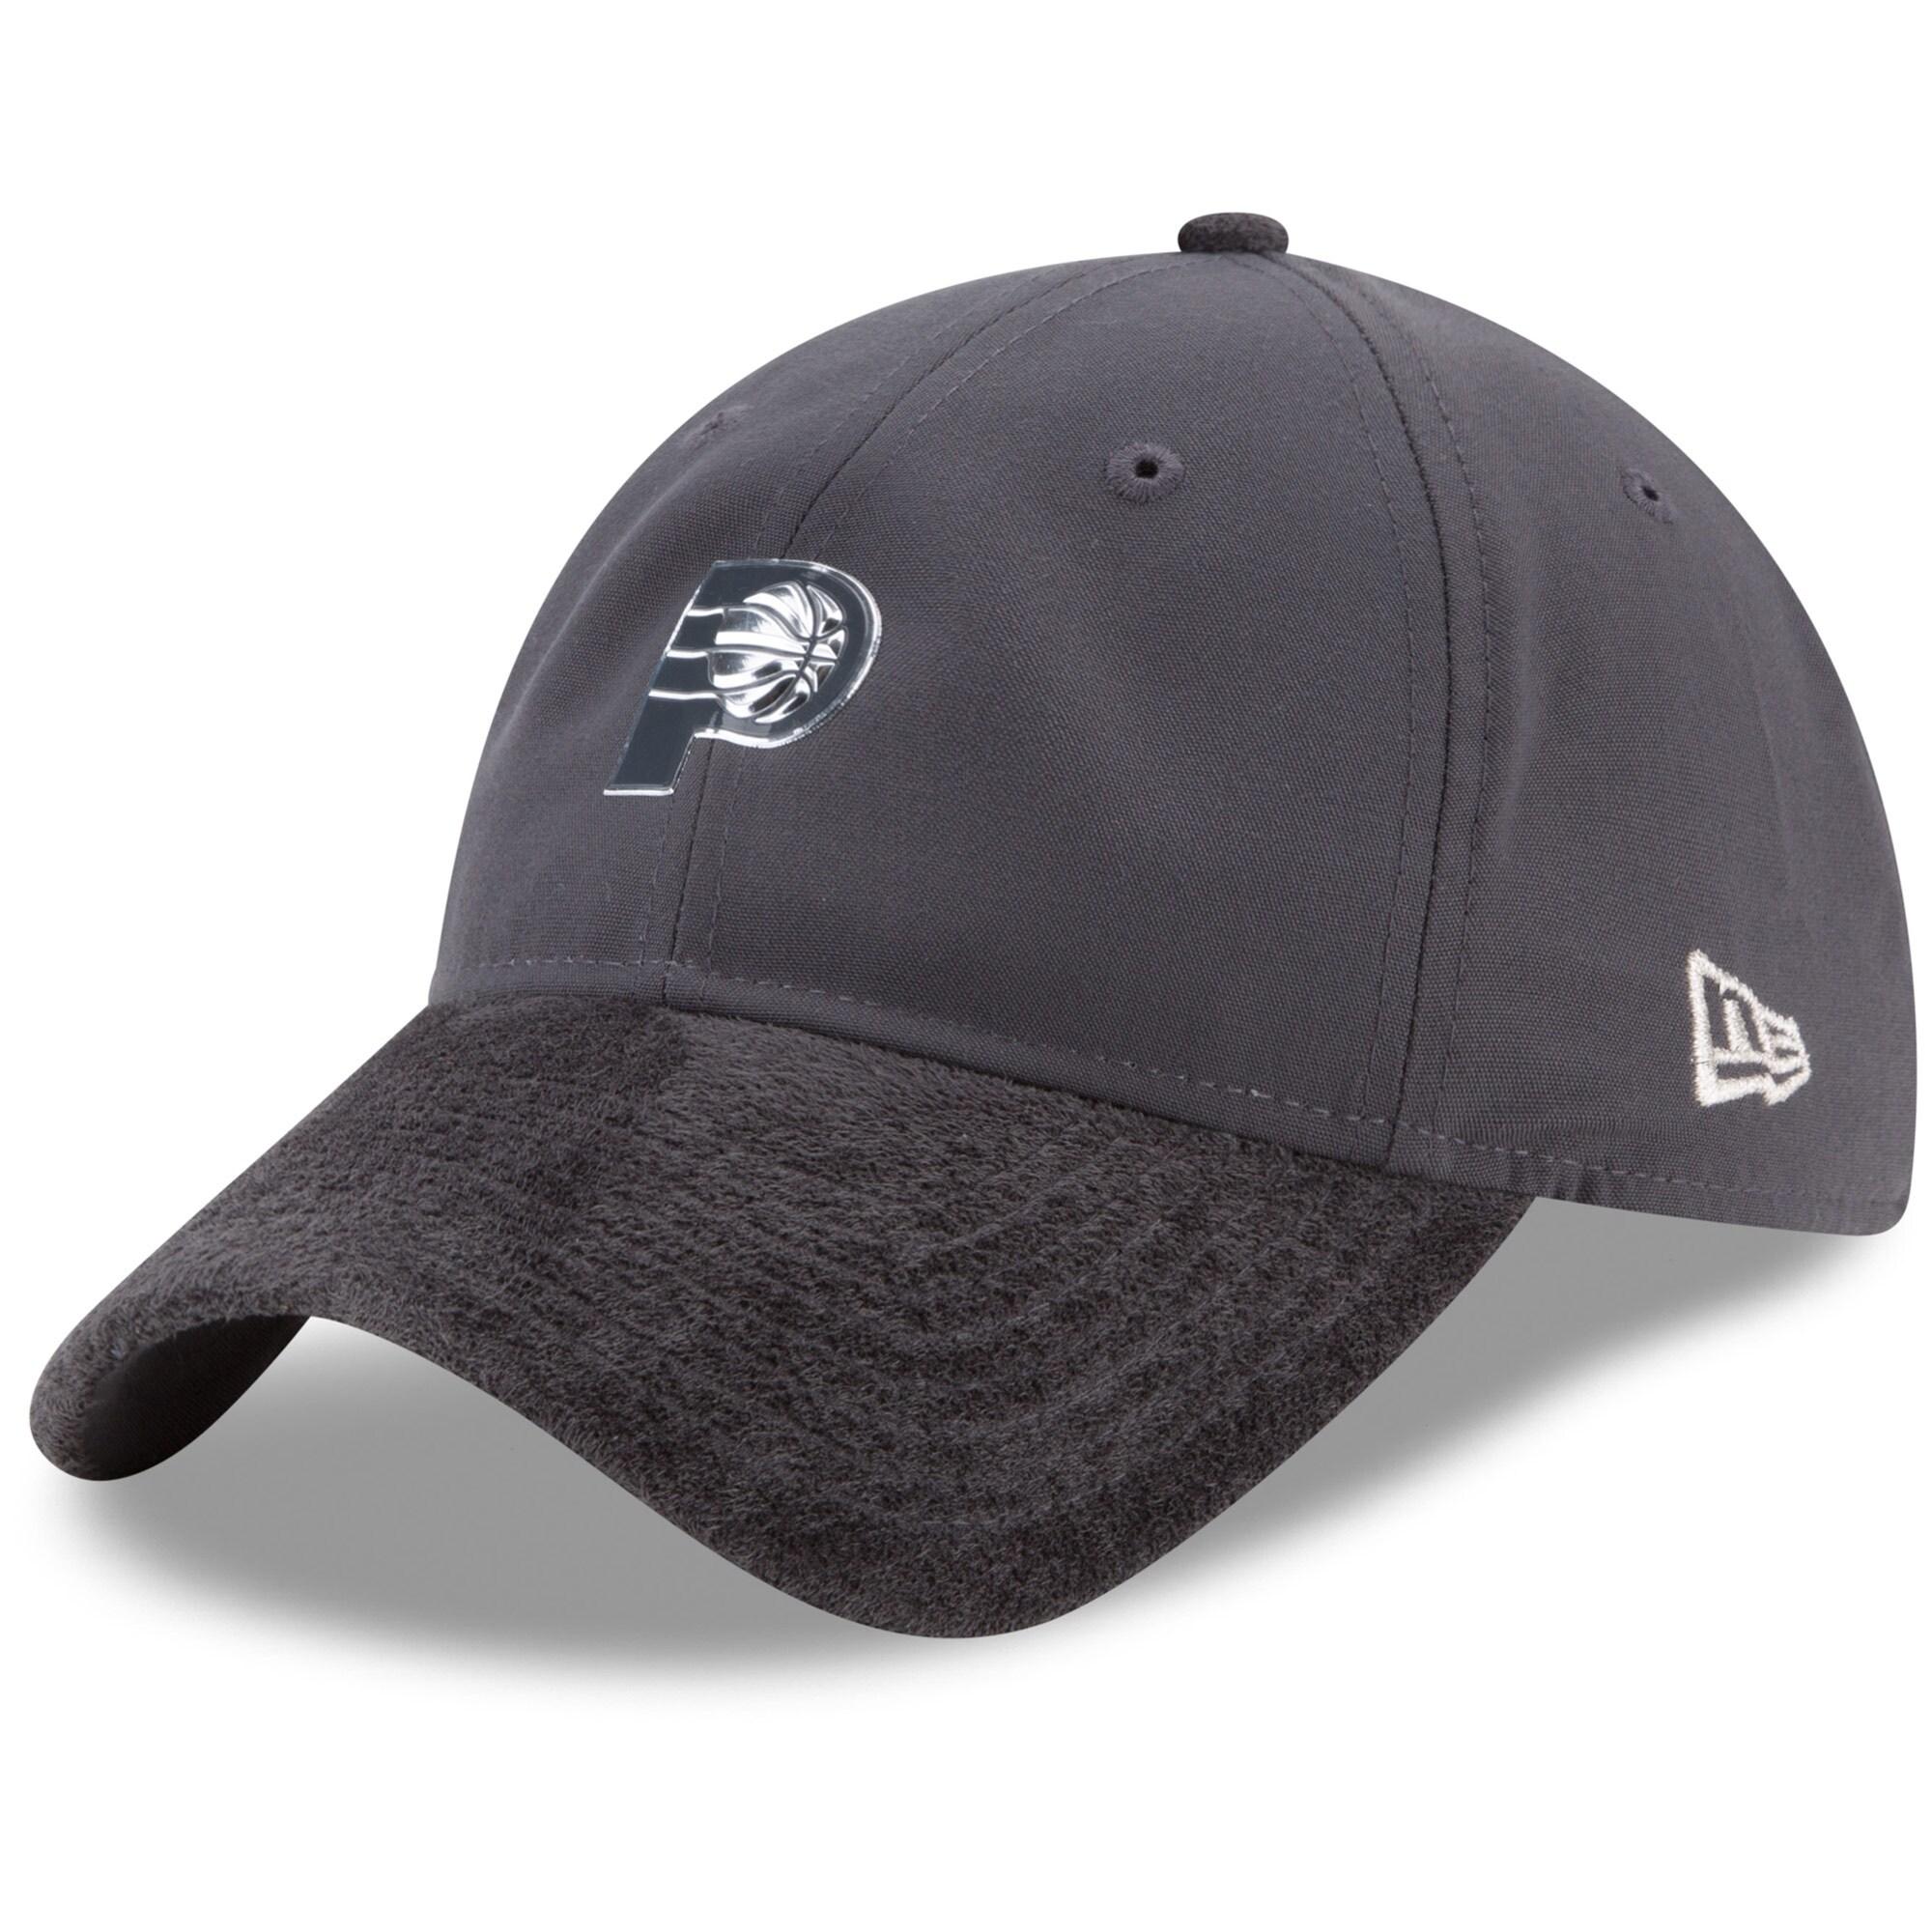 Indiana Pacers New Era On-Court Silver Logo 9TWENTY Adjustable Hat - Graphite